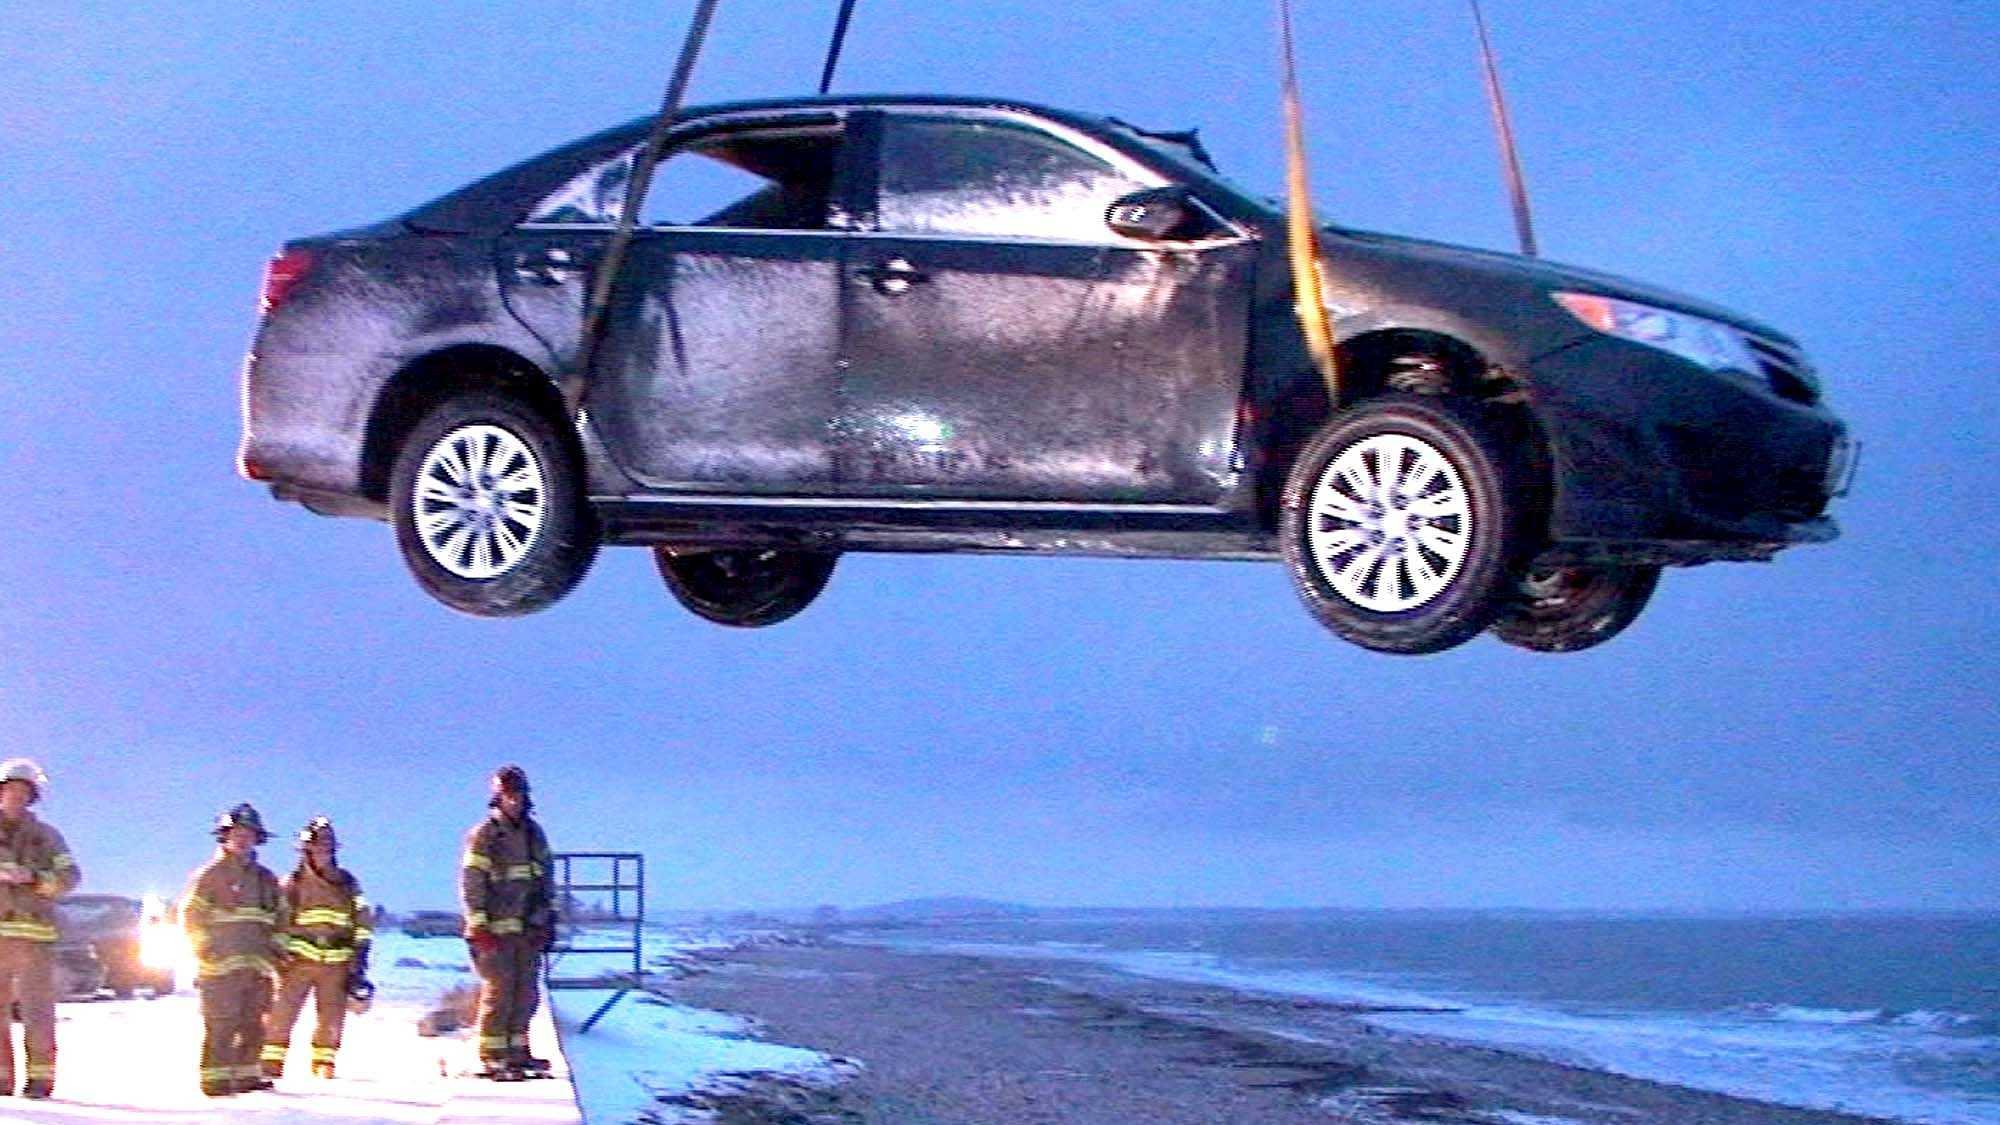 Plymouth Seawall crash